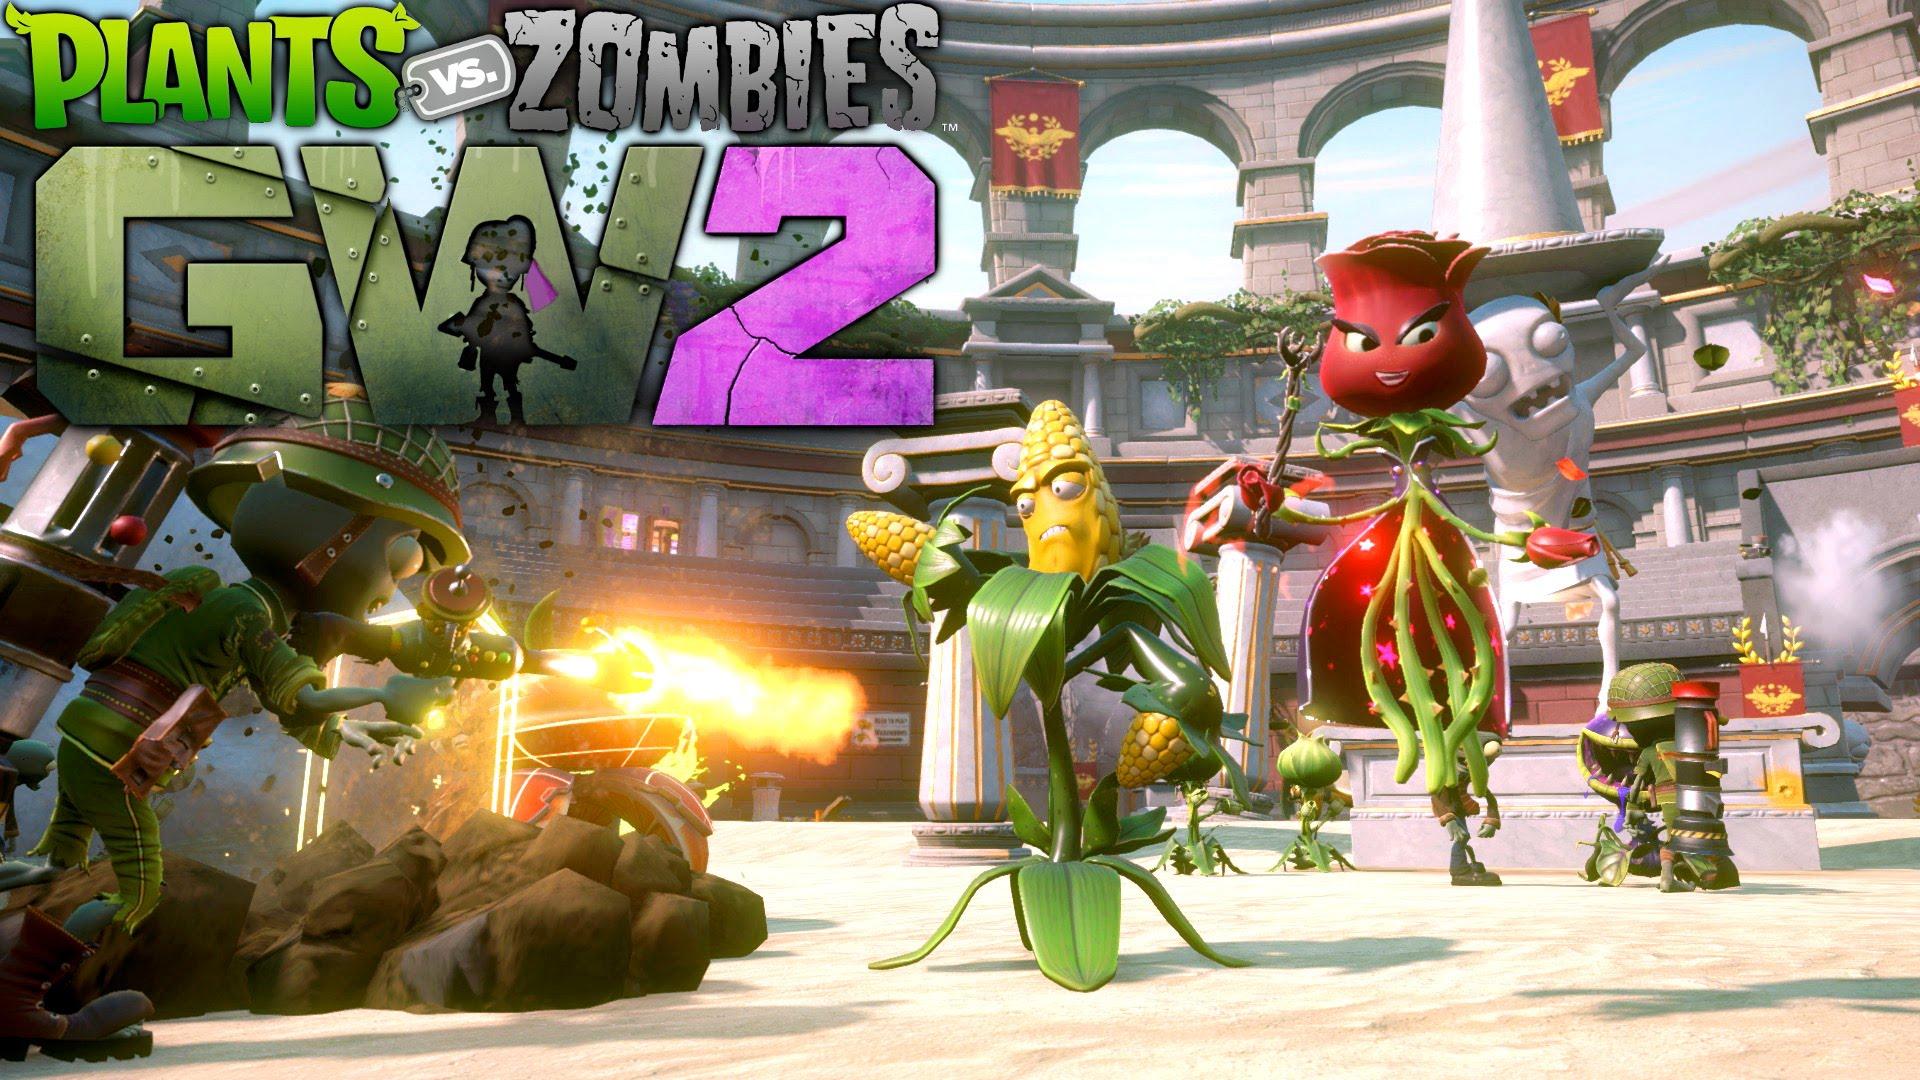 Plants vs zombies garden warfare 2 se acerca a xbox one for Plants vs zombies garden warfare 2 xbox 1